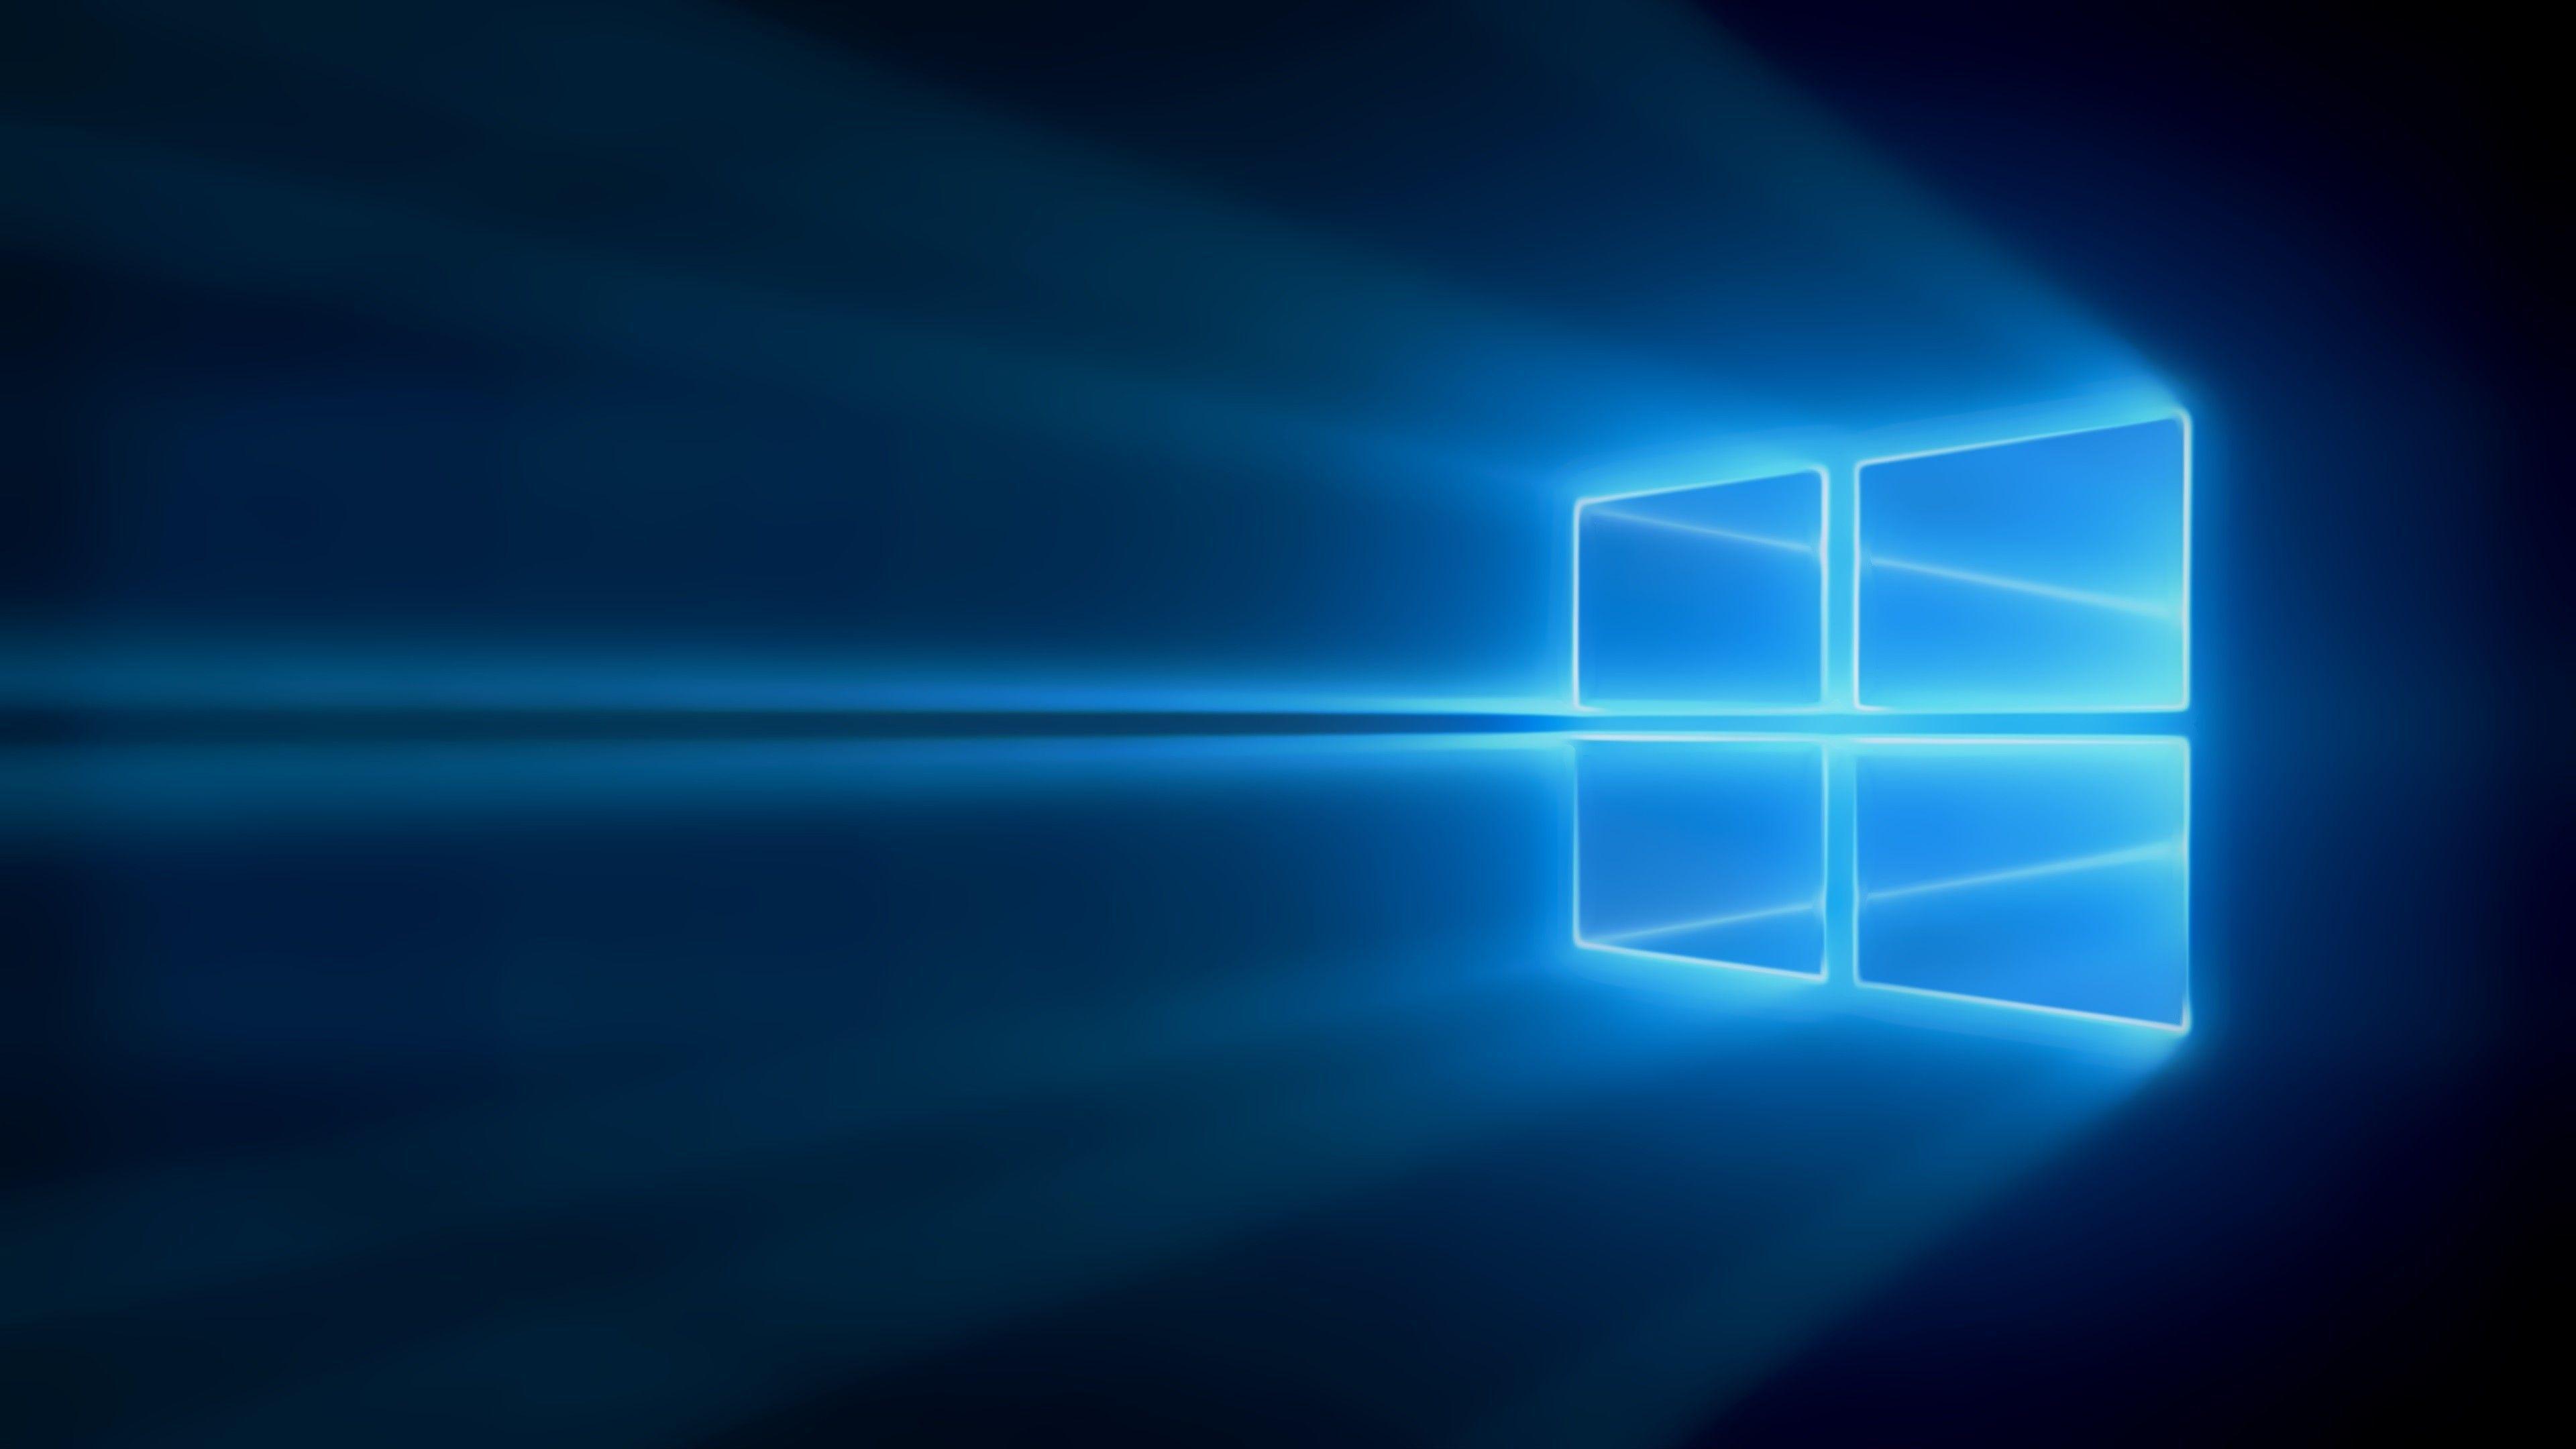 Black Windows 10 Hd Wallpapers Top Free Black Windows 10 Hd Backgrounds Wallpaperaccess